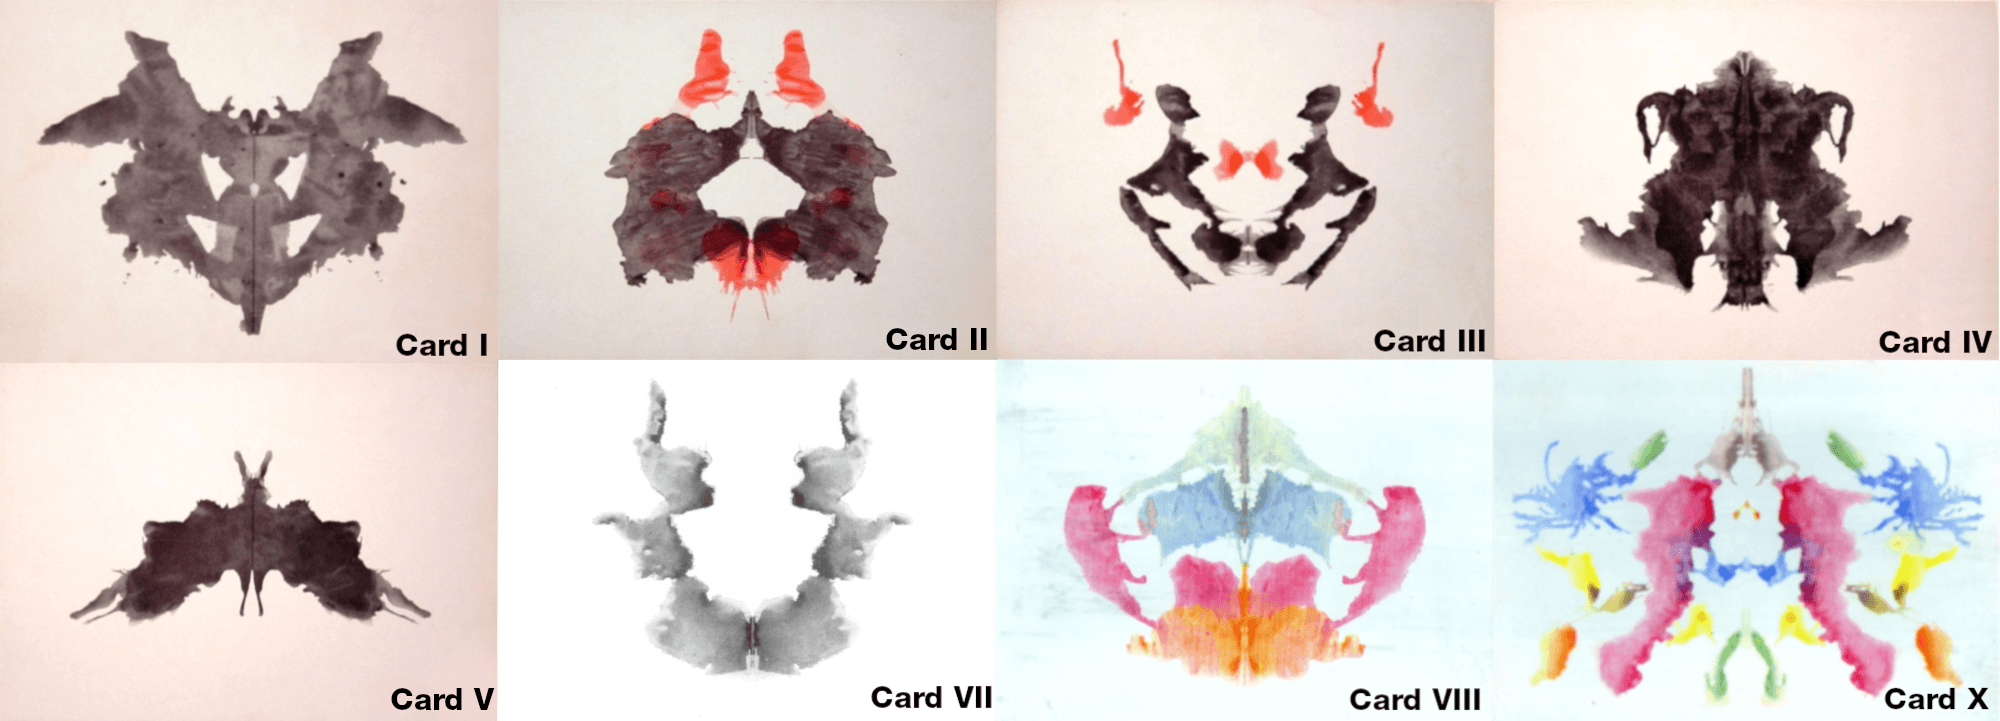 Inkblot cards